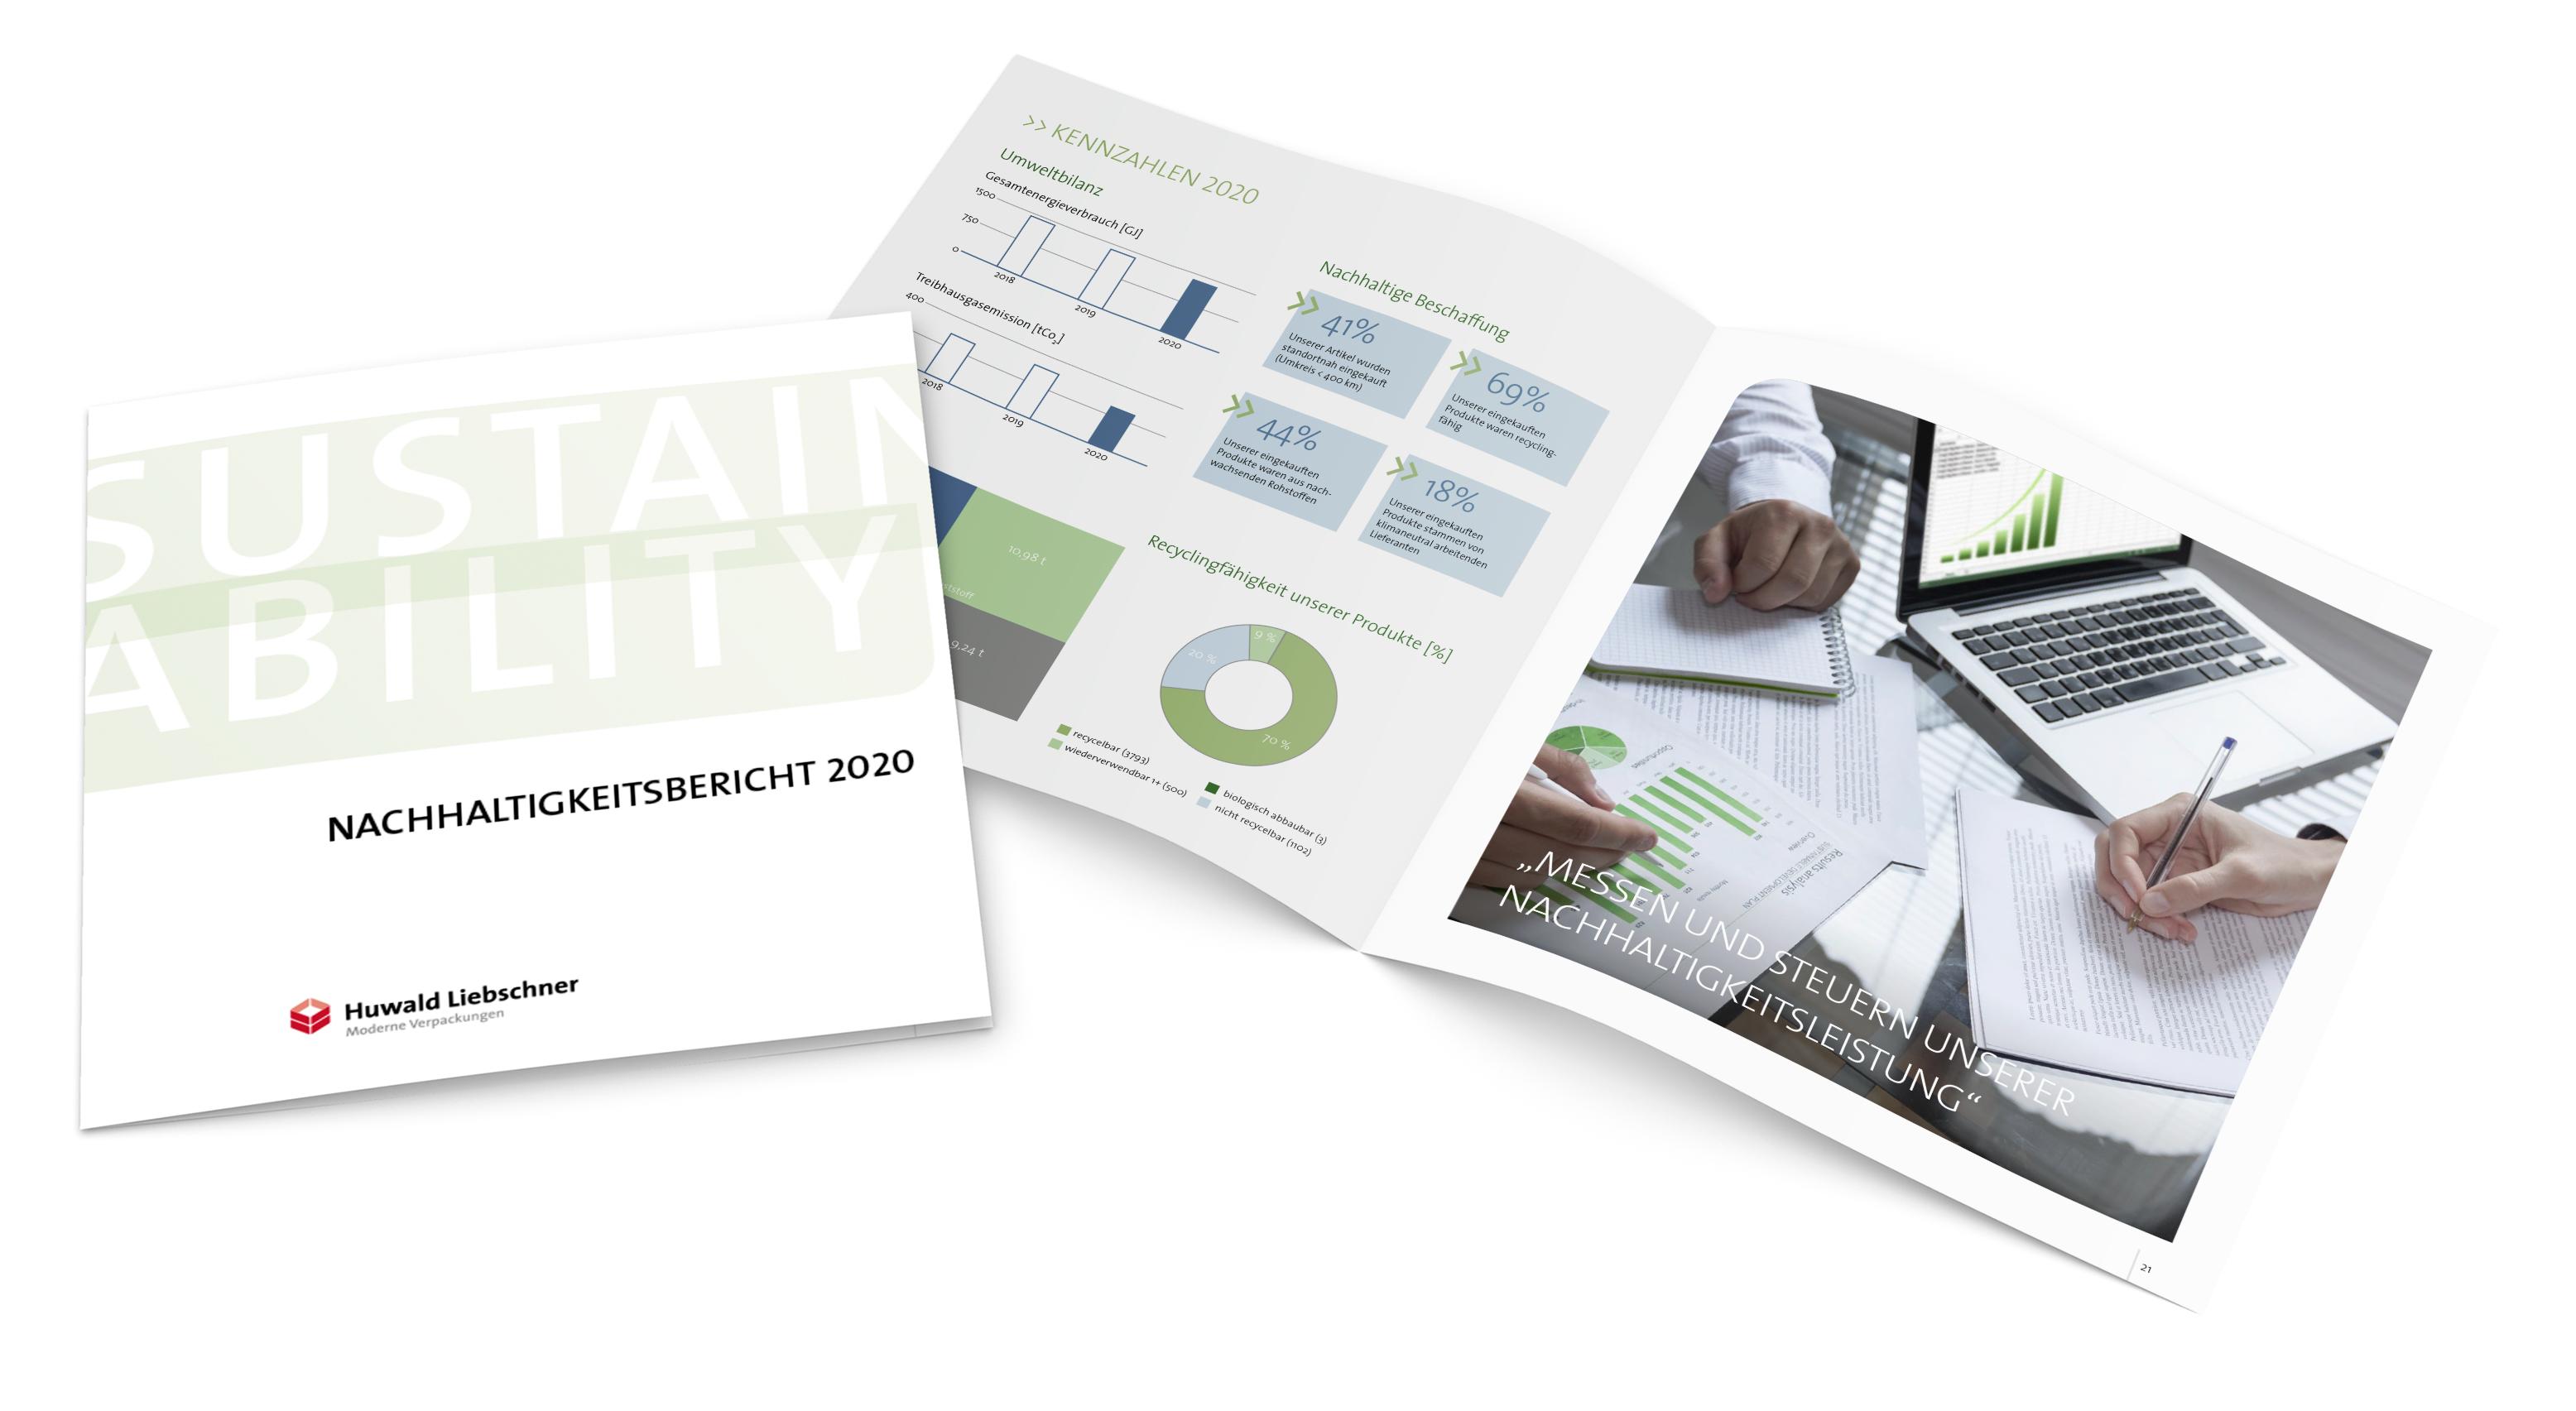 Nachhaltigkeitsbroschüre 2020